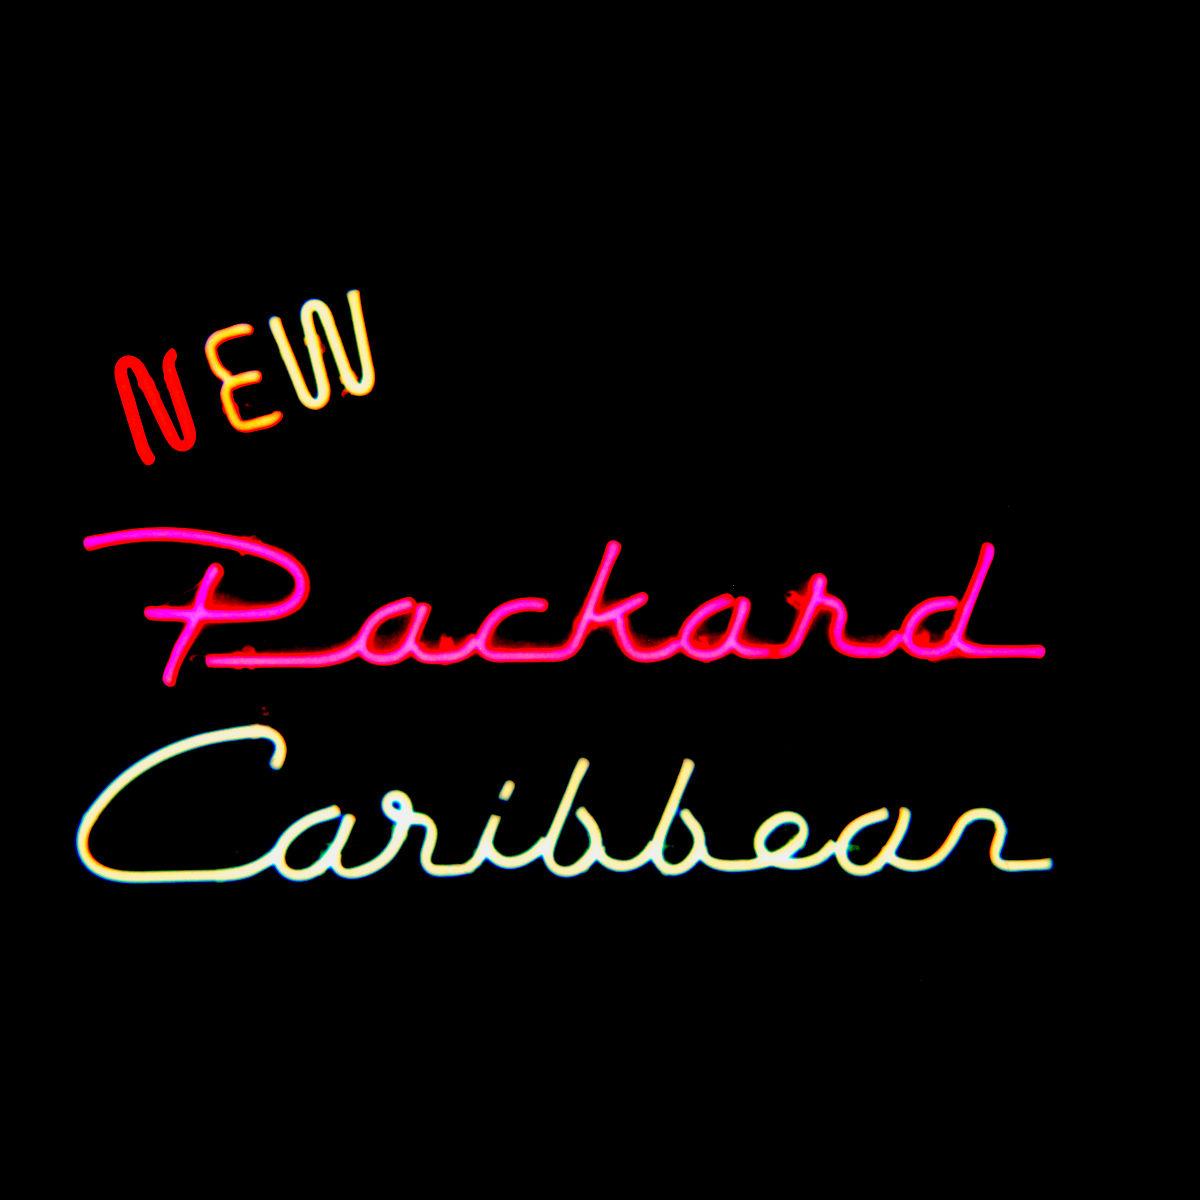 Packard Neon Signs